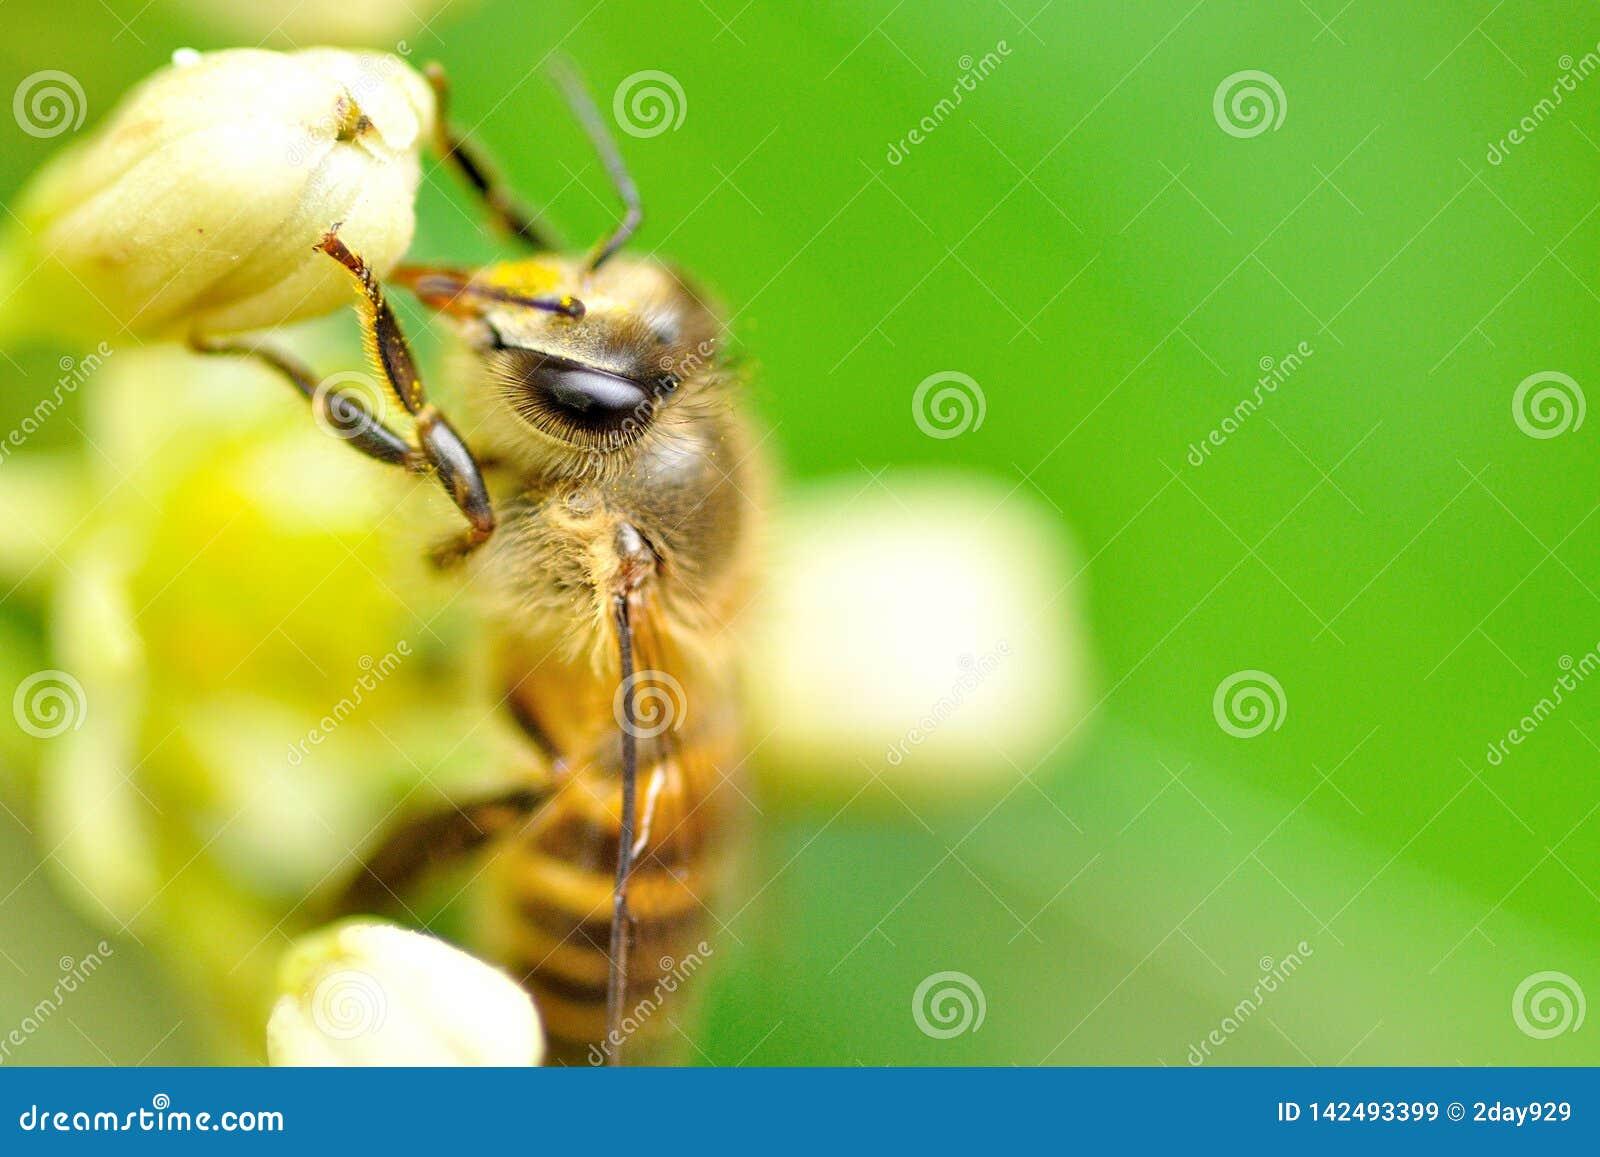 Uma abelha do mel